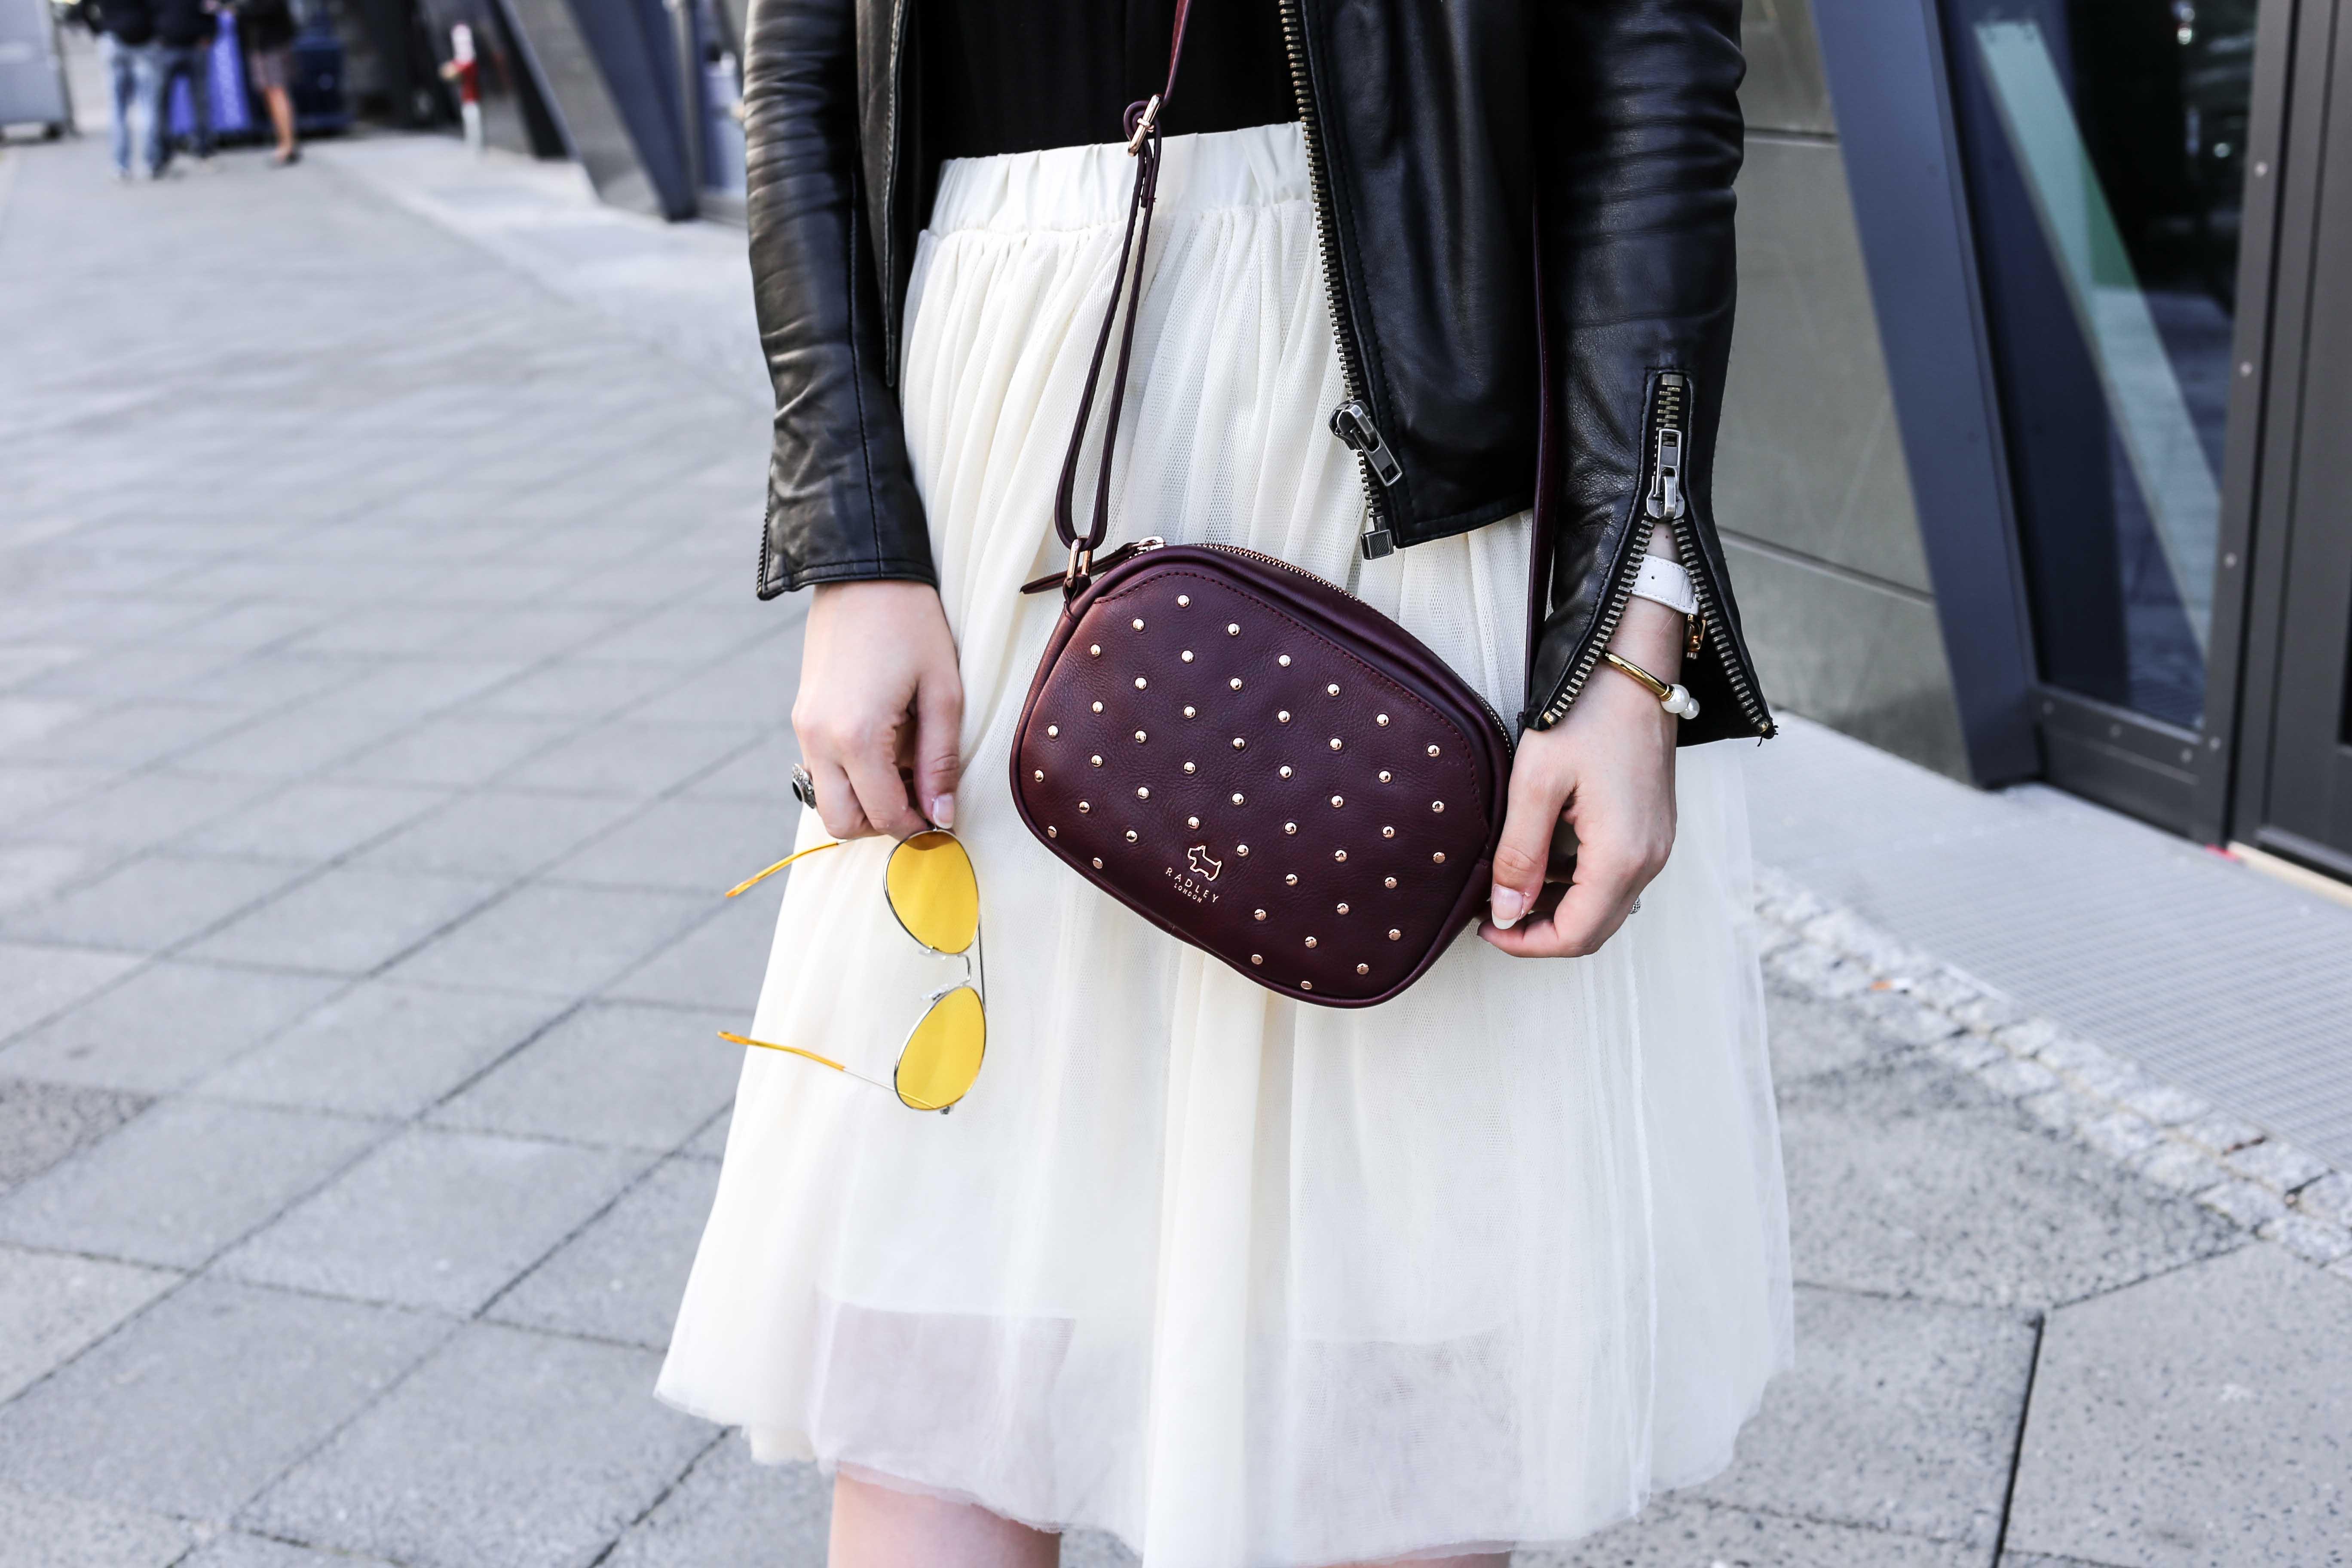 fashion-week-look-schnürbody-plisseerock-retro-sonnenbrille-fashionblog-modeblog-berlin-köln_8839